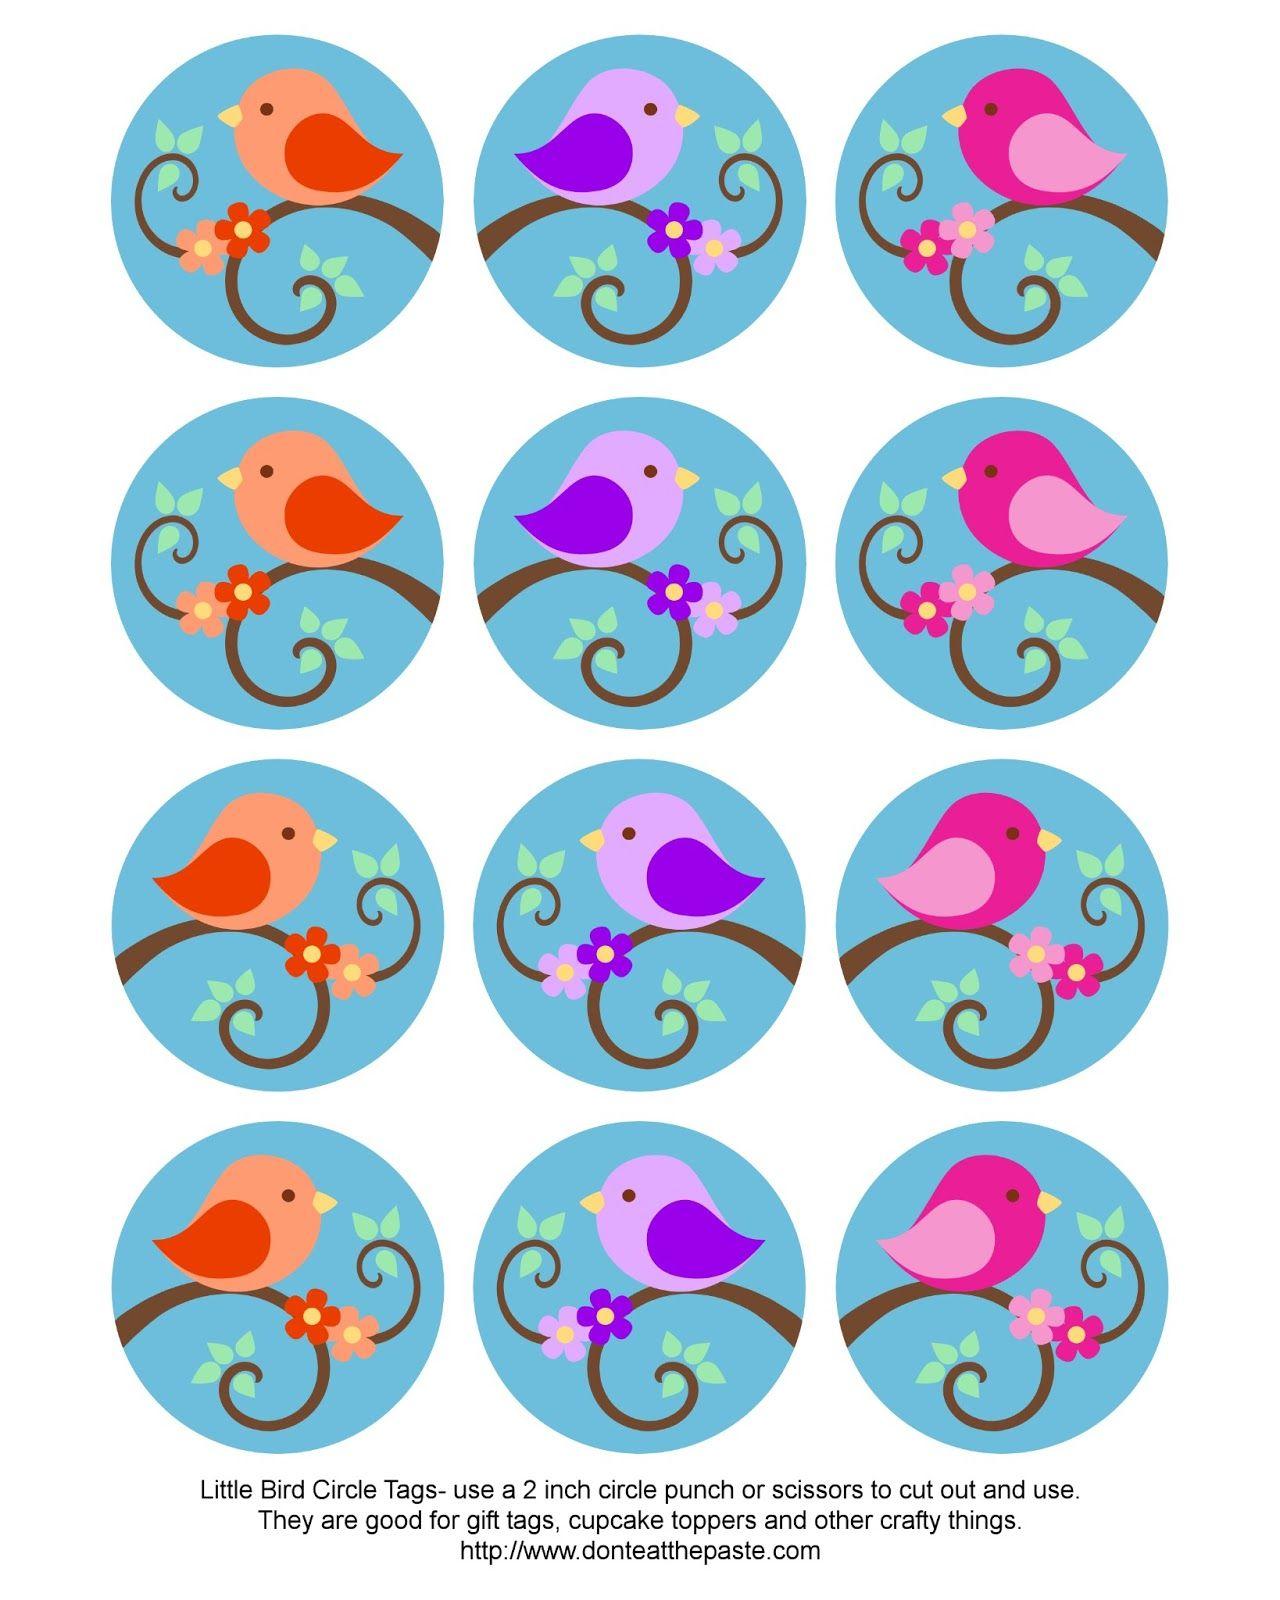 Little Bird Circle Tags